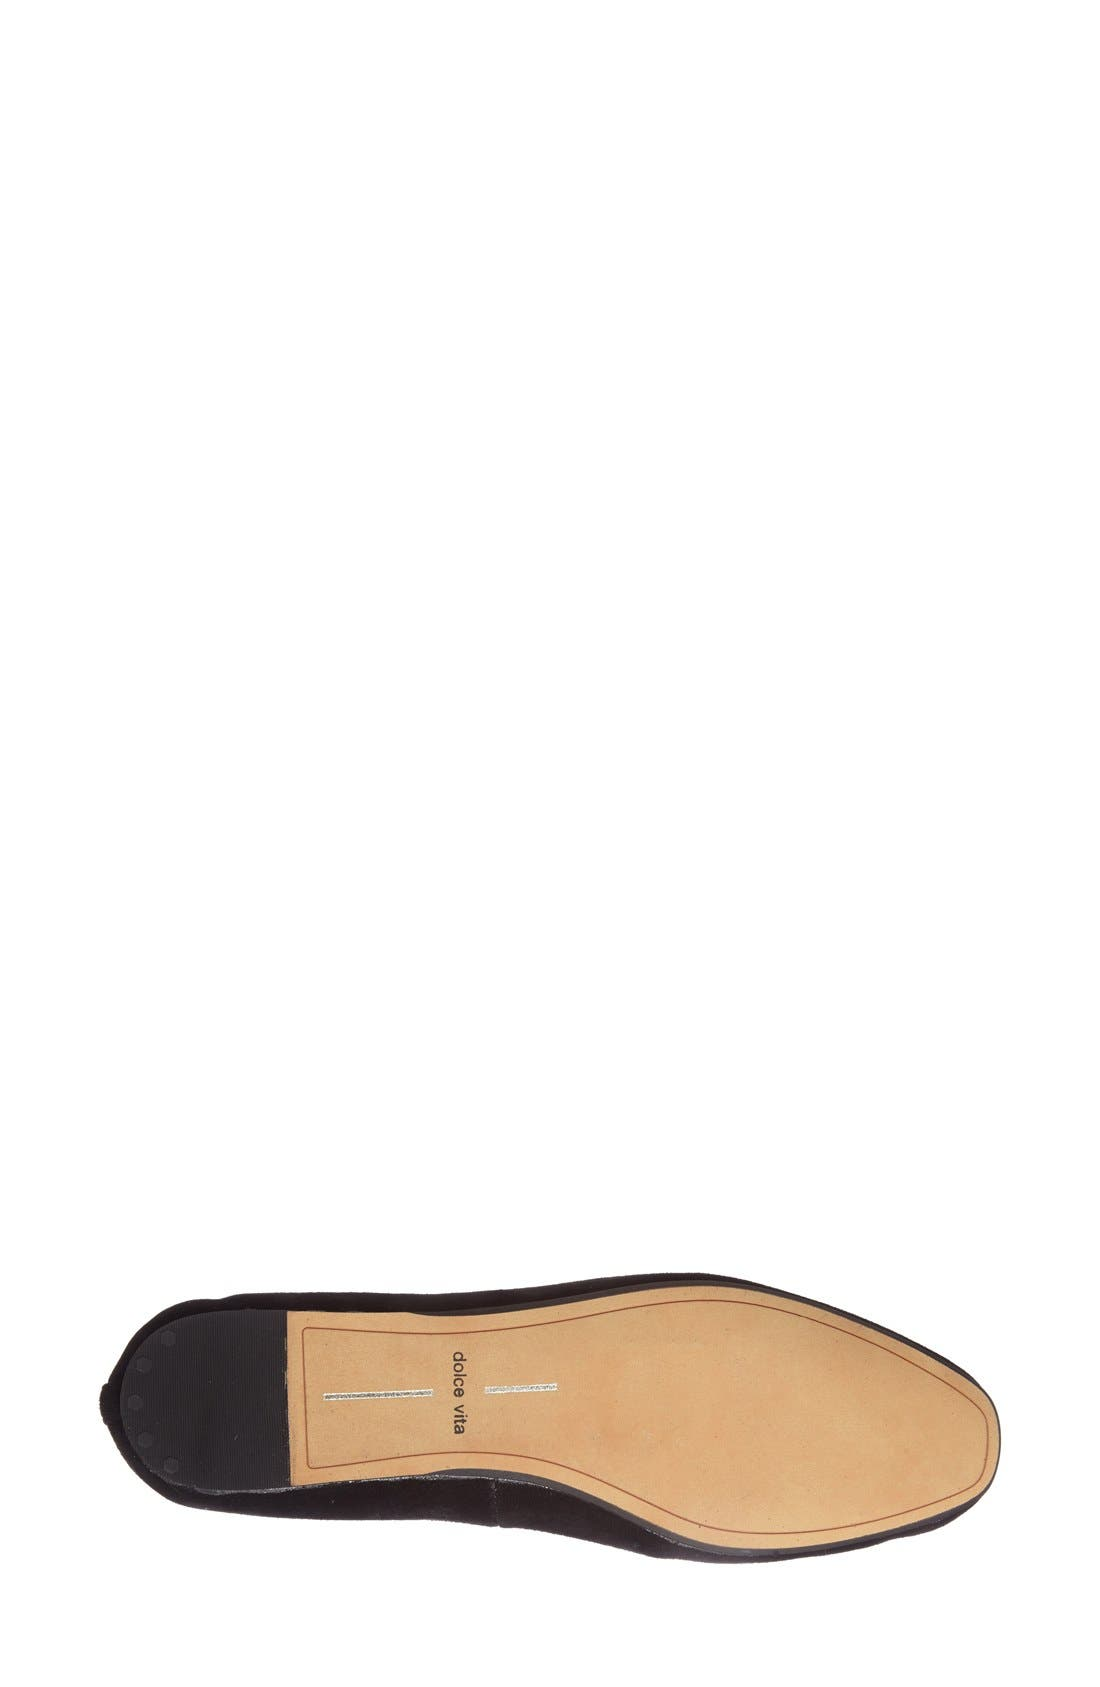 'Brannon' Smoking Loafer,                             Alternate thumbnail 3, color,                             001